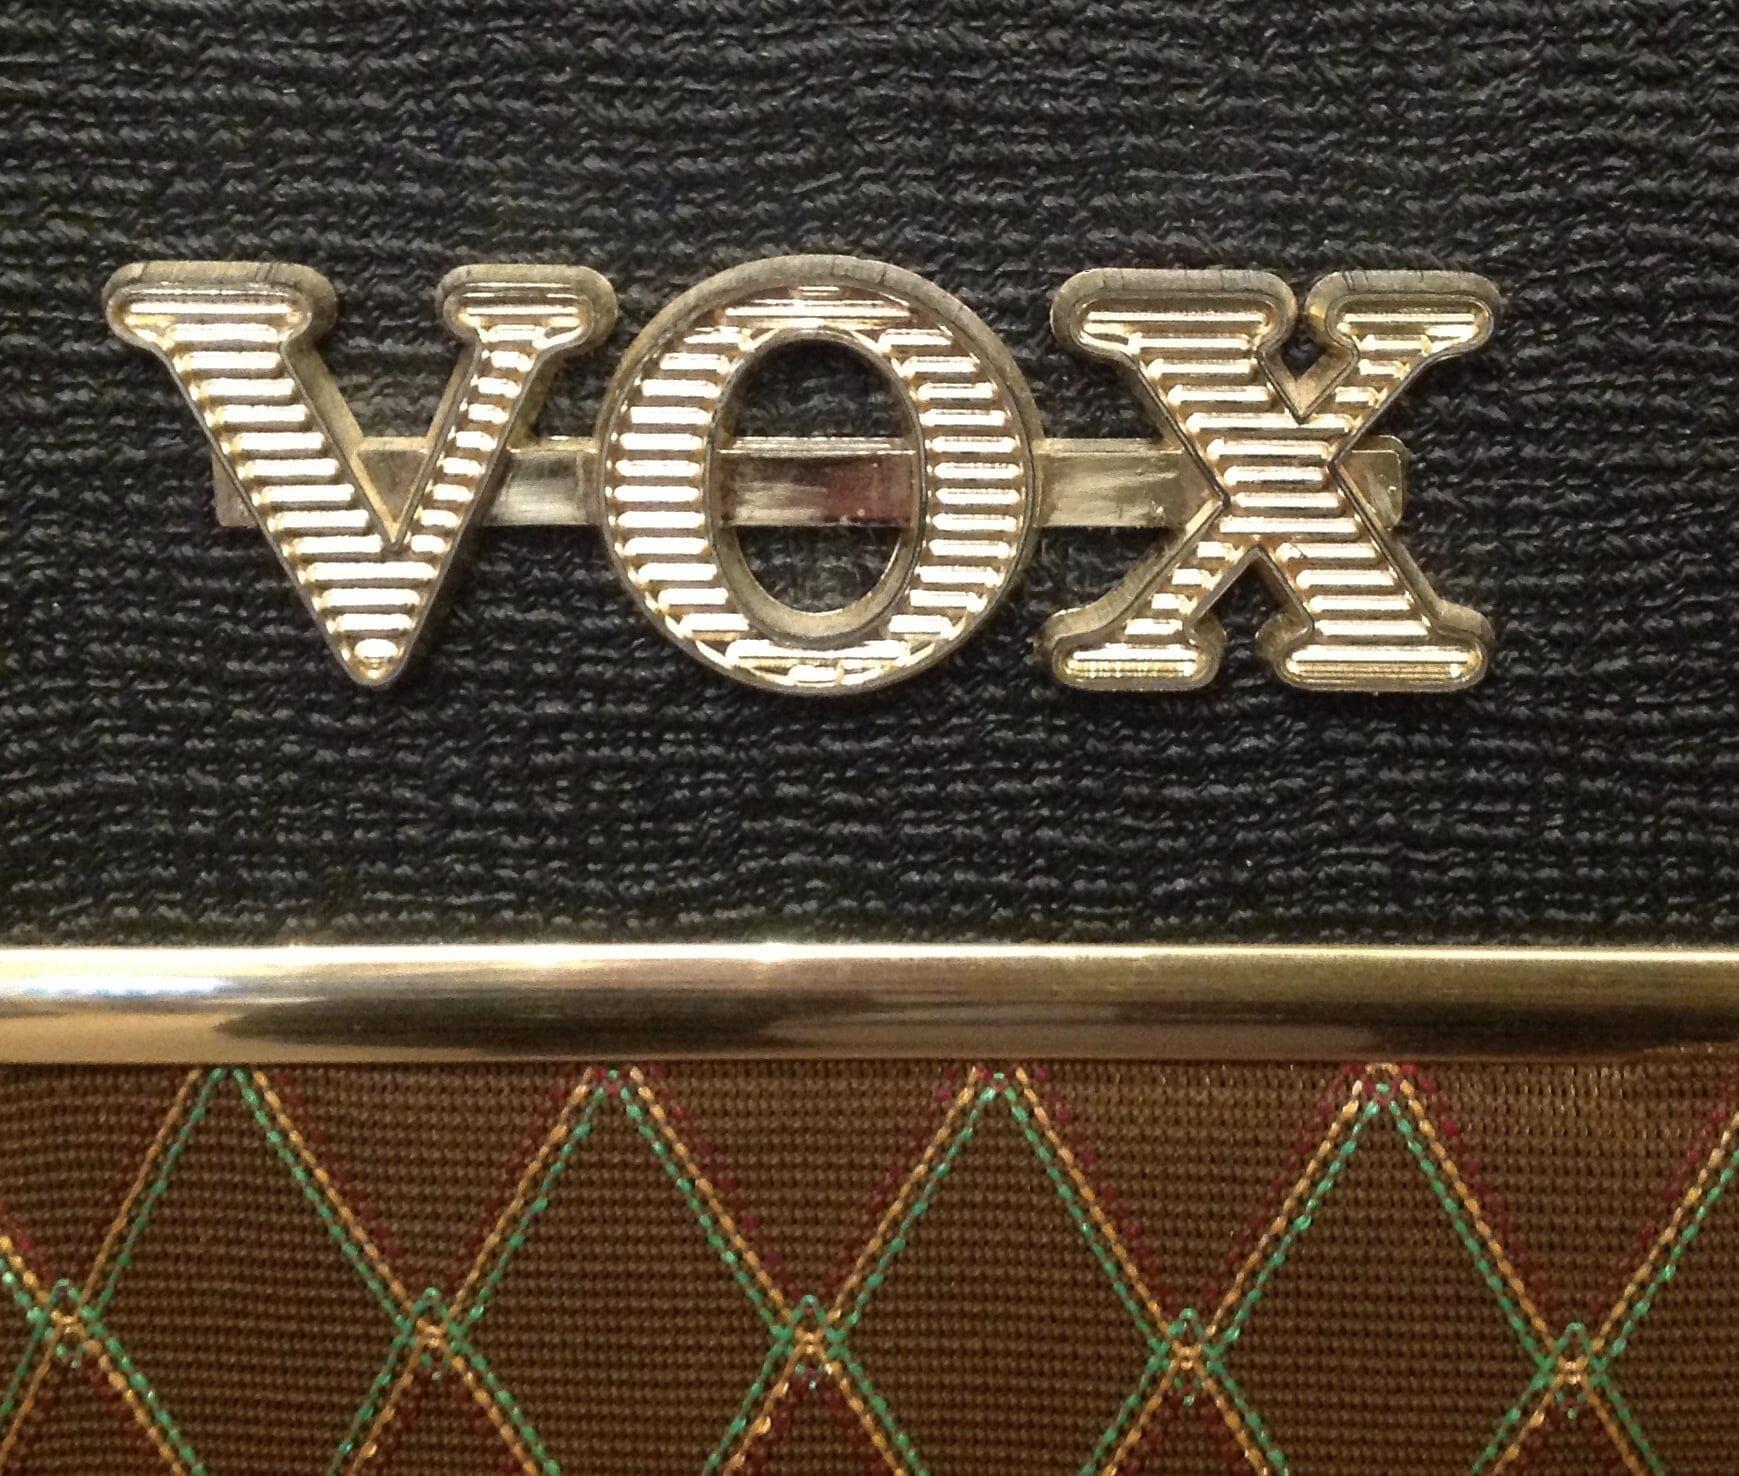 Vox Logo image